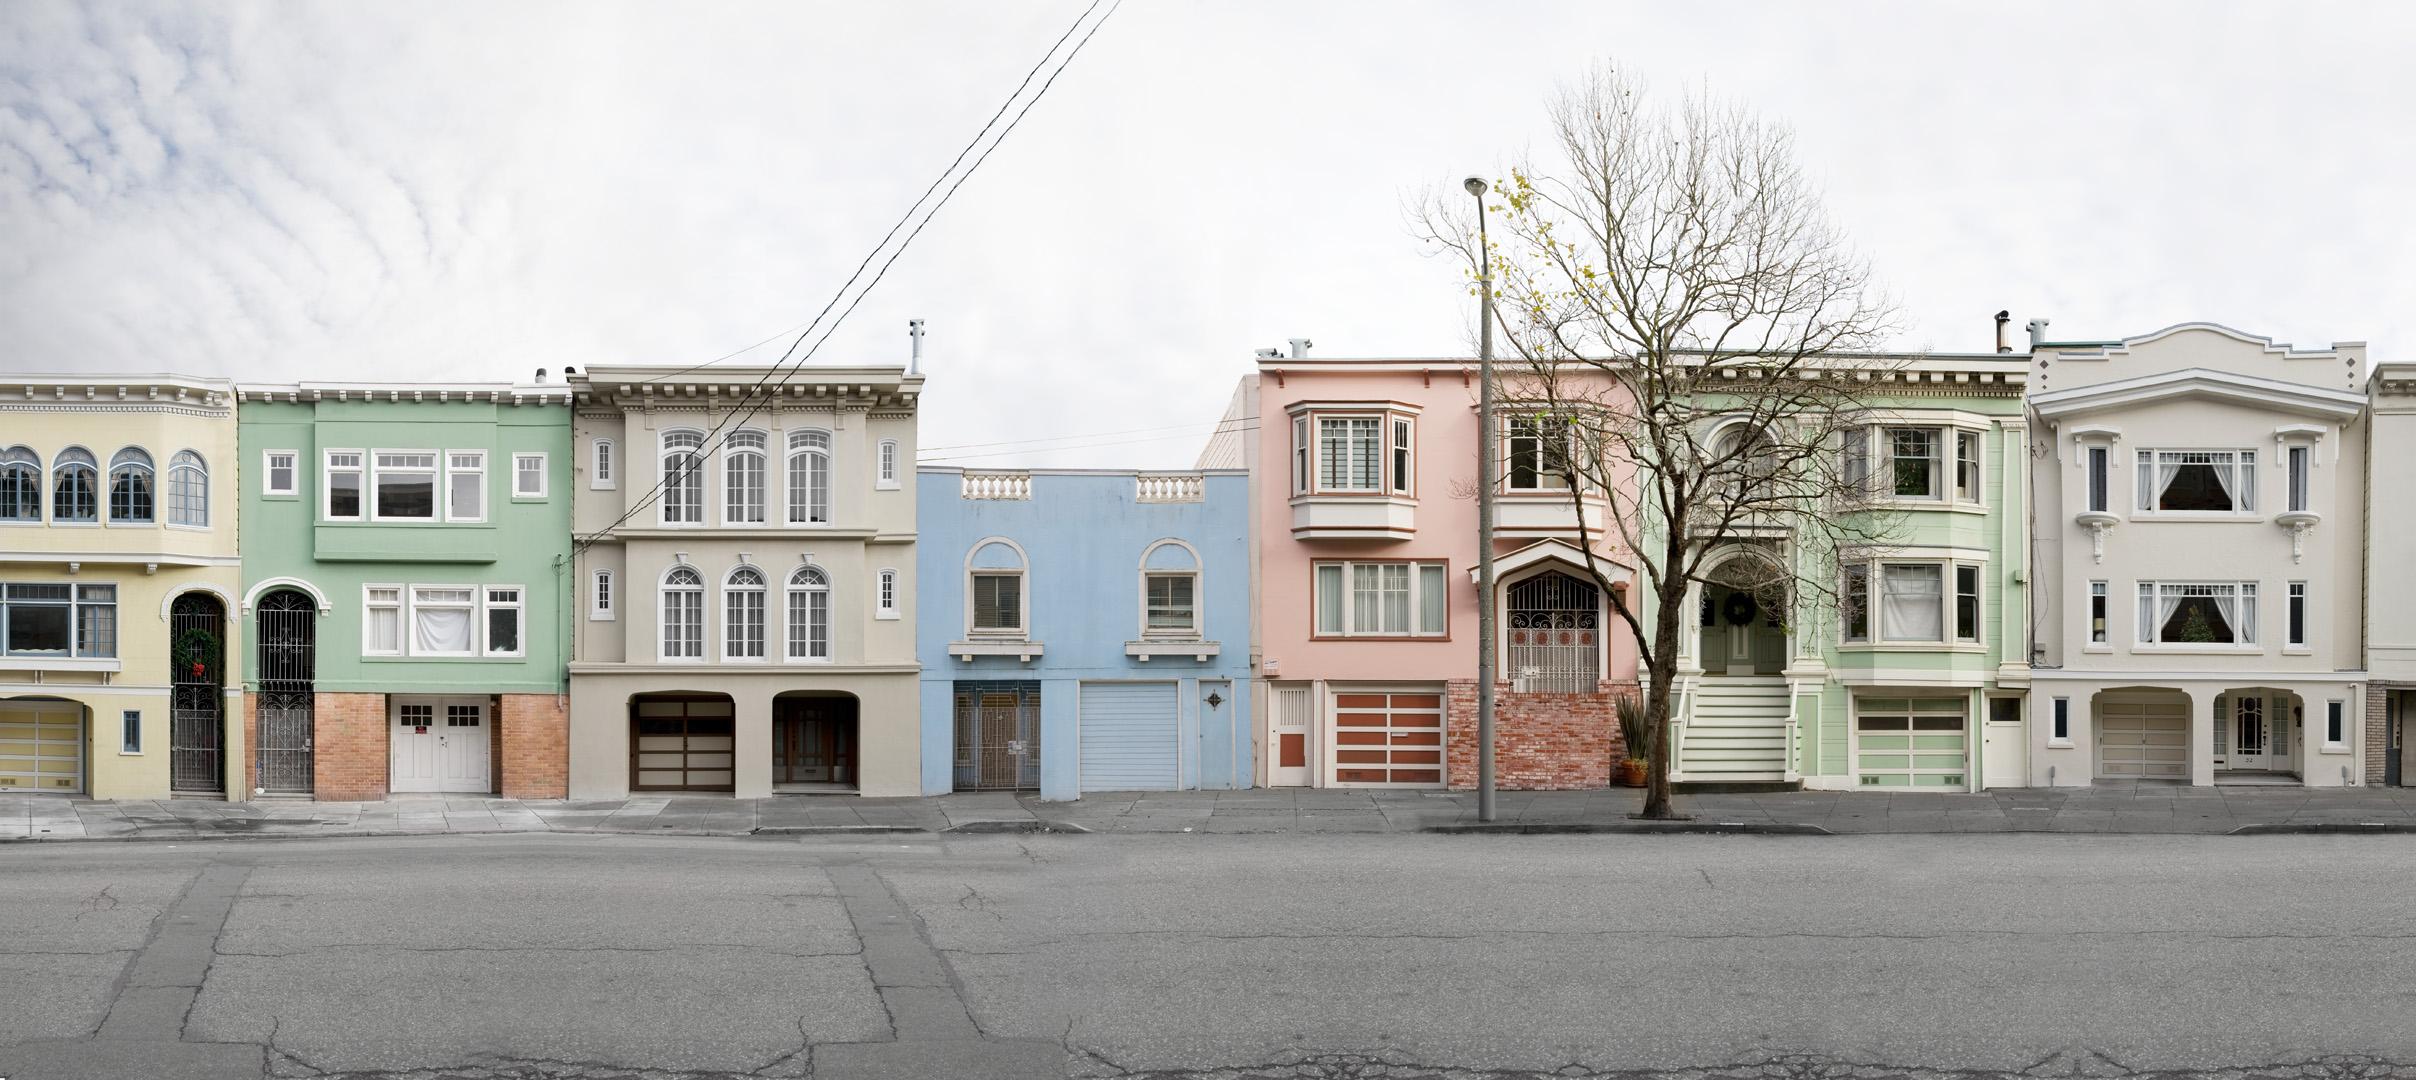 Fulton Street,  24 x 54 inches, archival pigment print, 2009